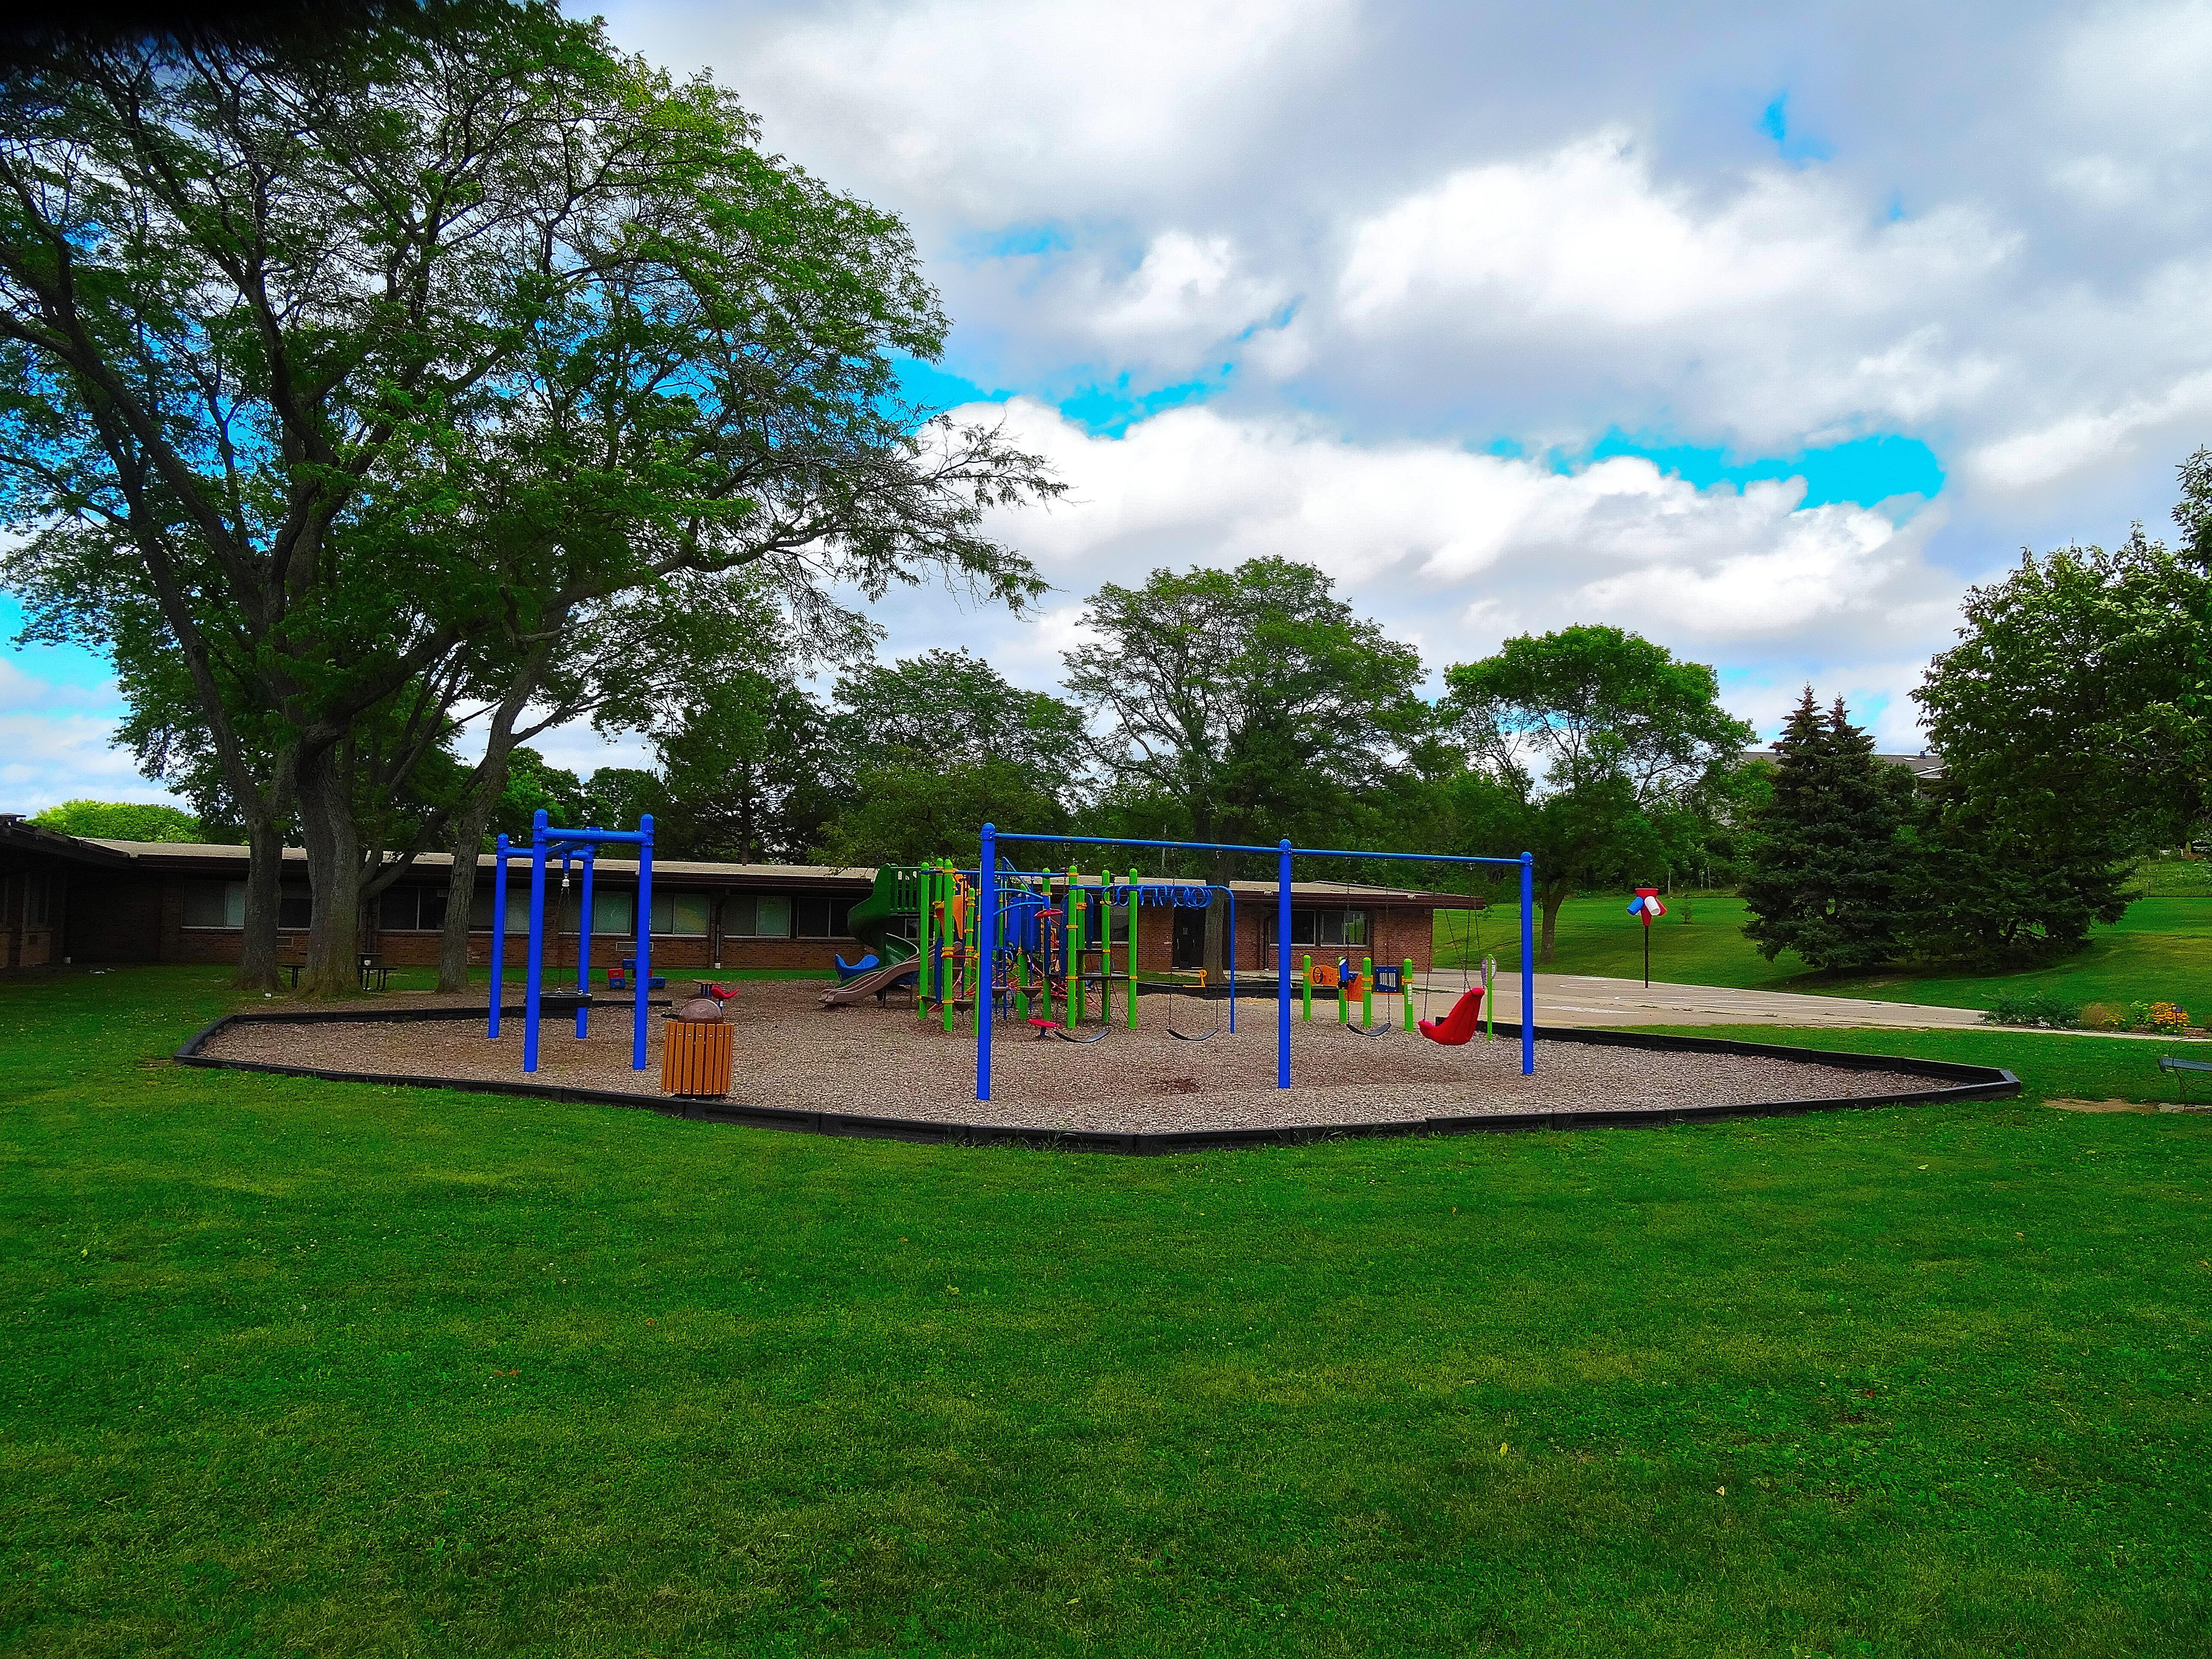 file gompers elementary school playground panoramio jpg wikipedia